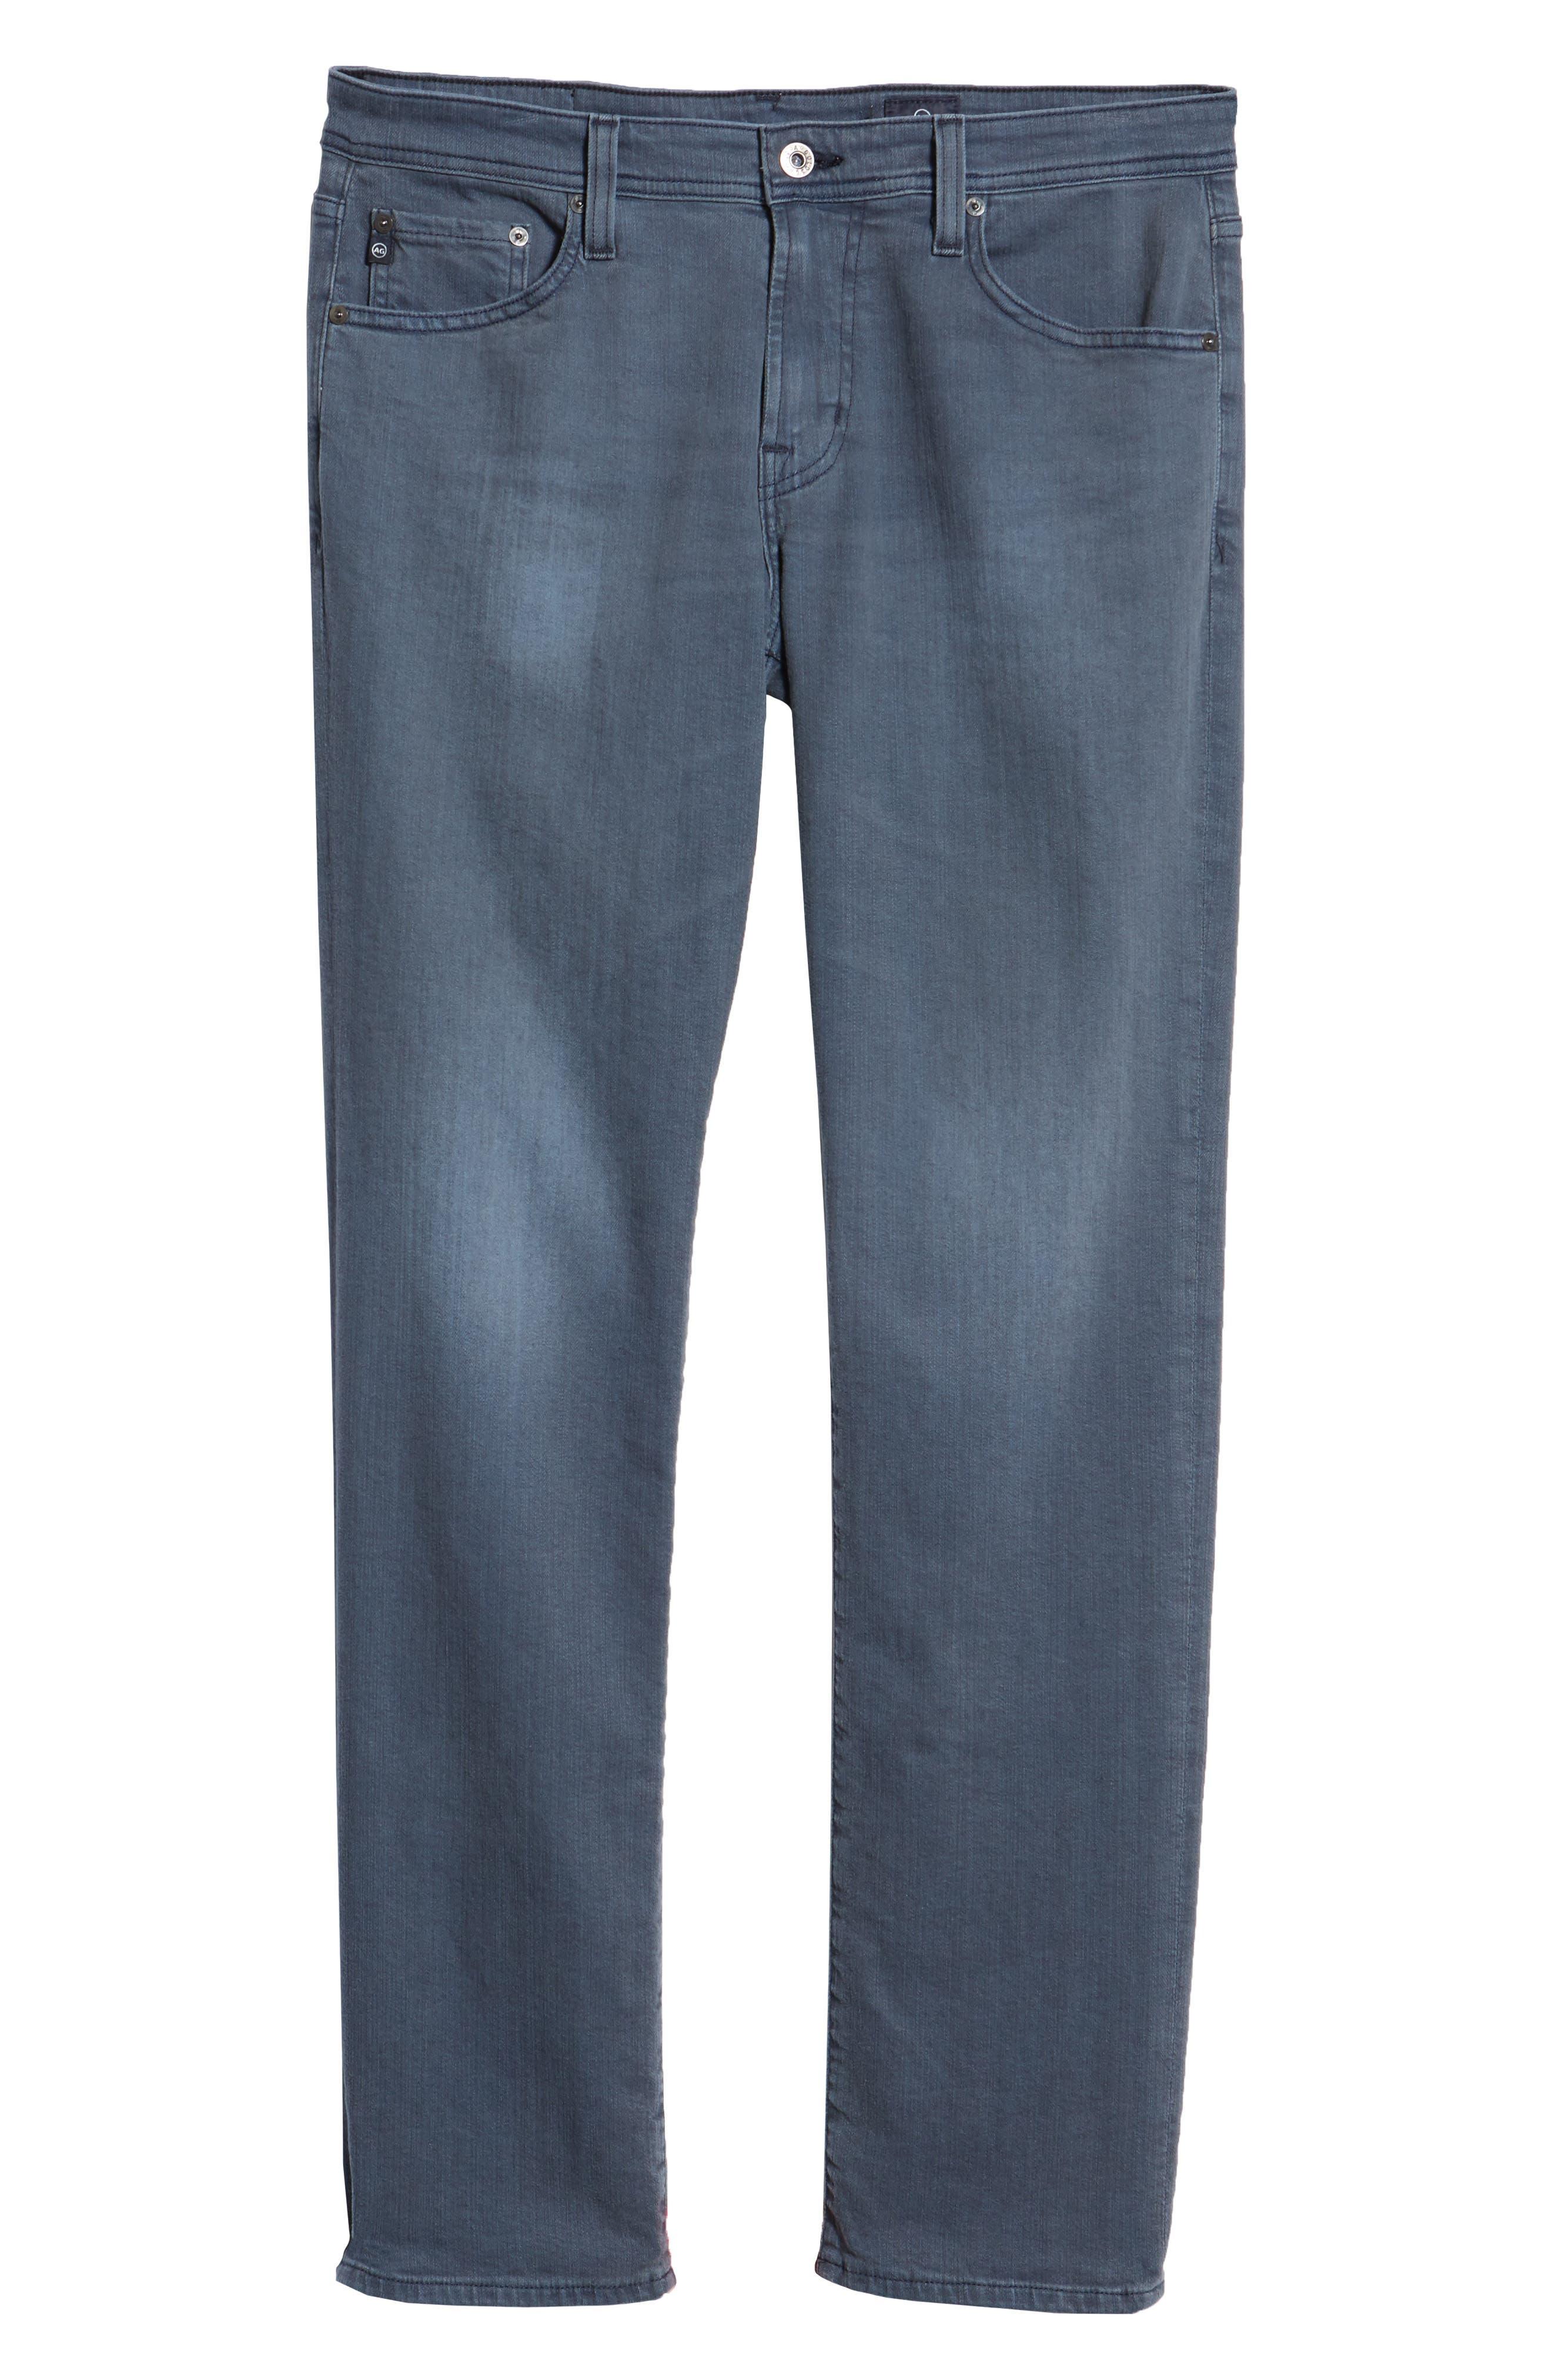 Graduate Slim Straight Leg Jeans,                             Alternate thumbnail 6, color,                             FLUXING TIDES